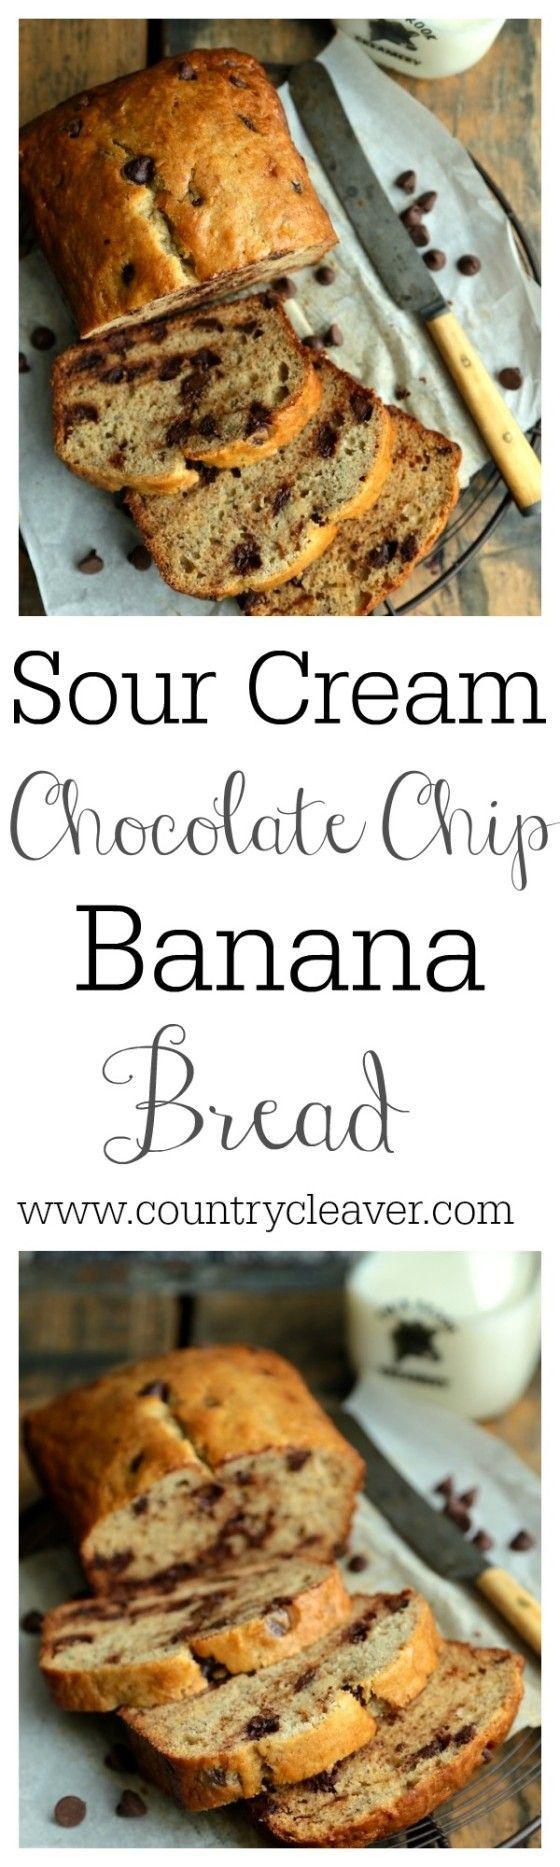 Sour Cream Chocolate Chip Banana Bread